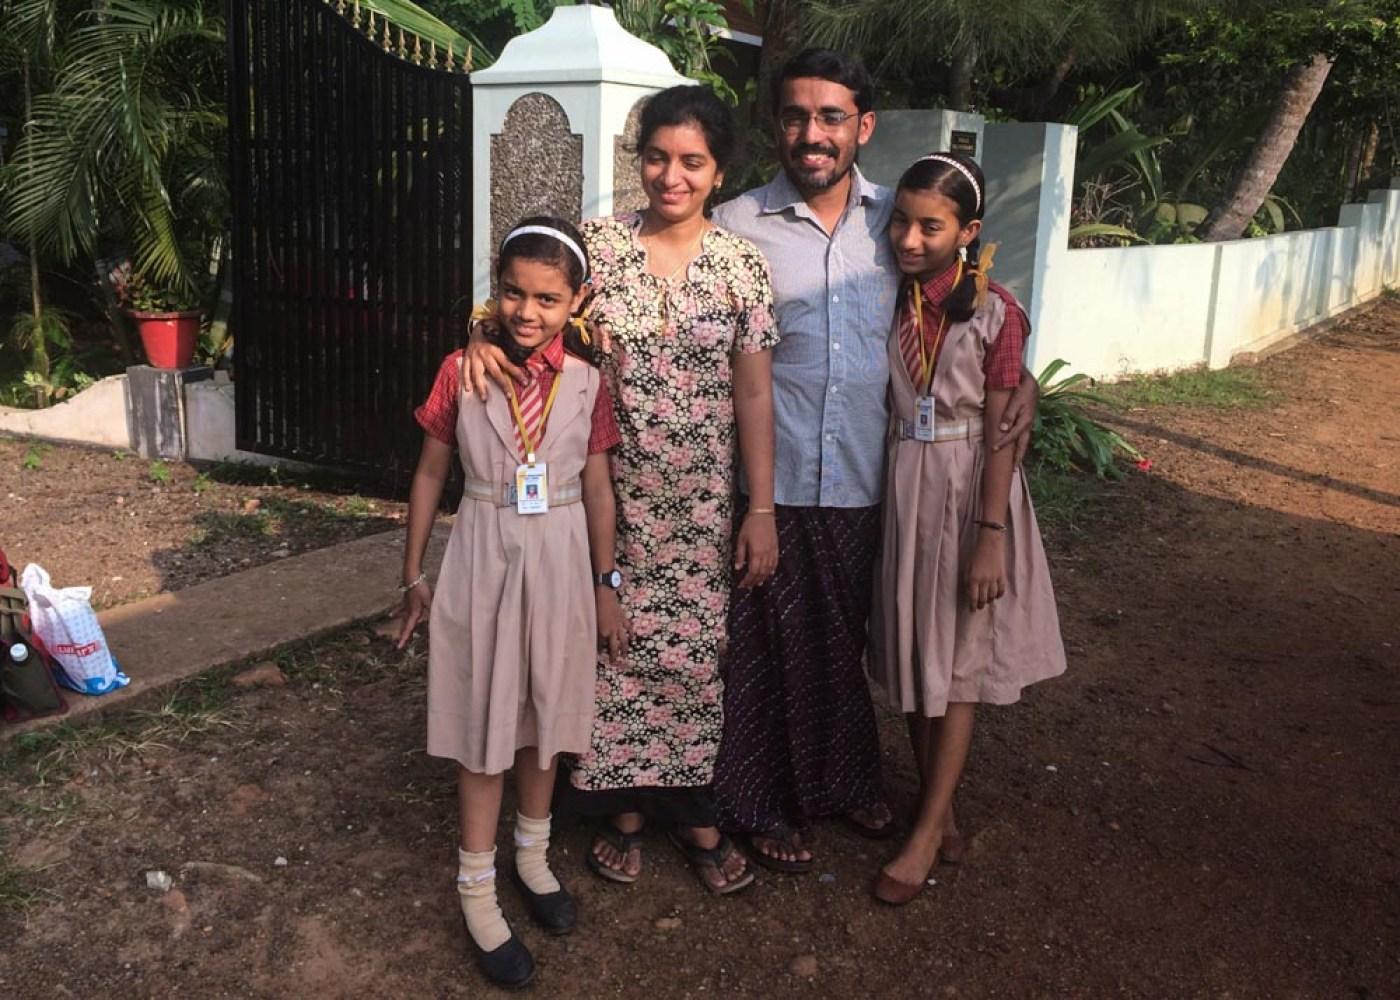 The best hospitality at Greenpalms Homestay in Kerala